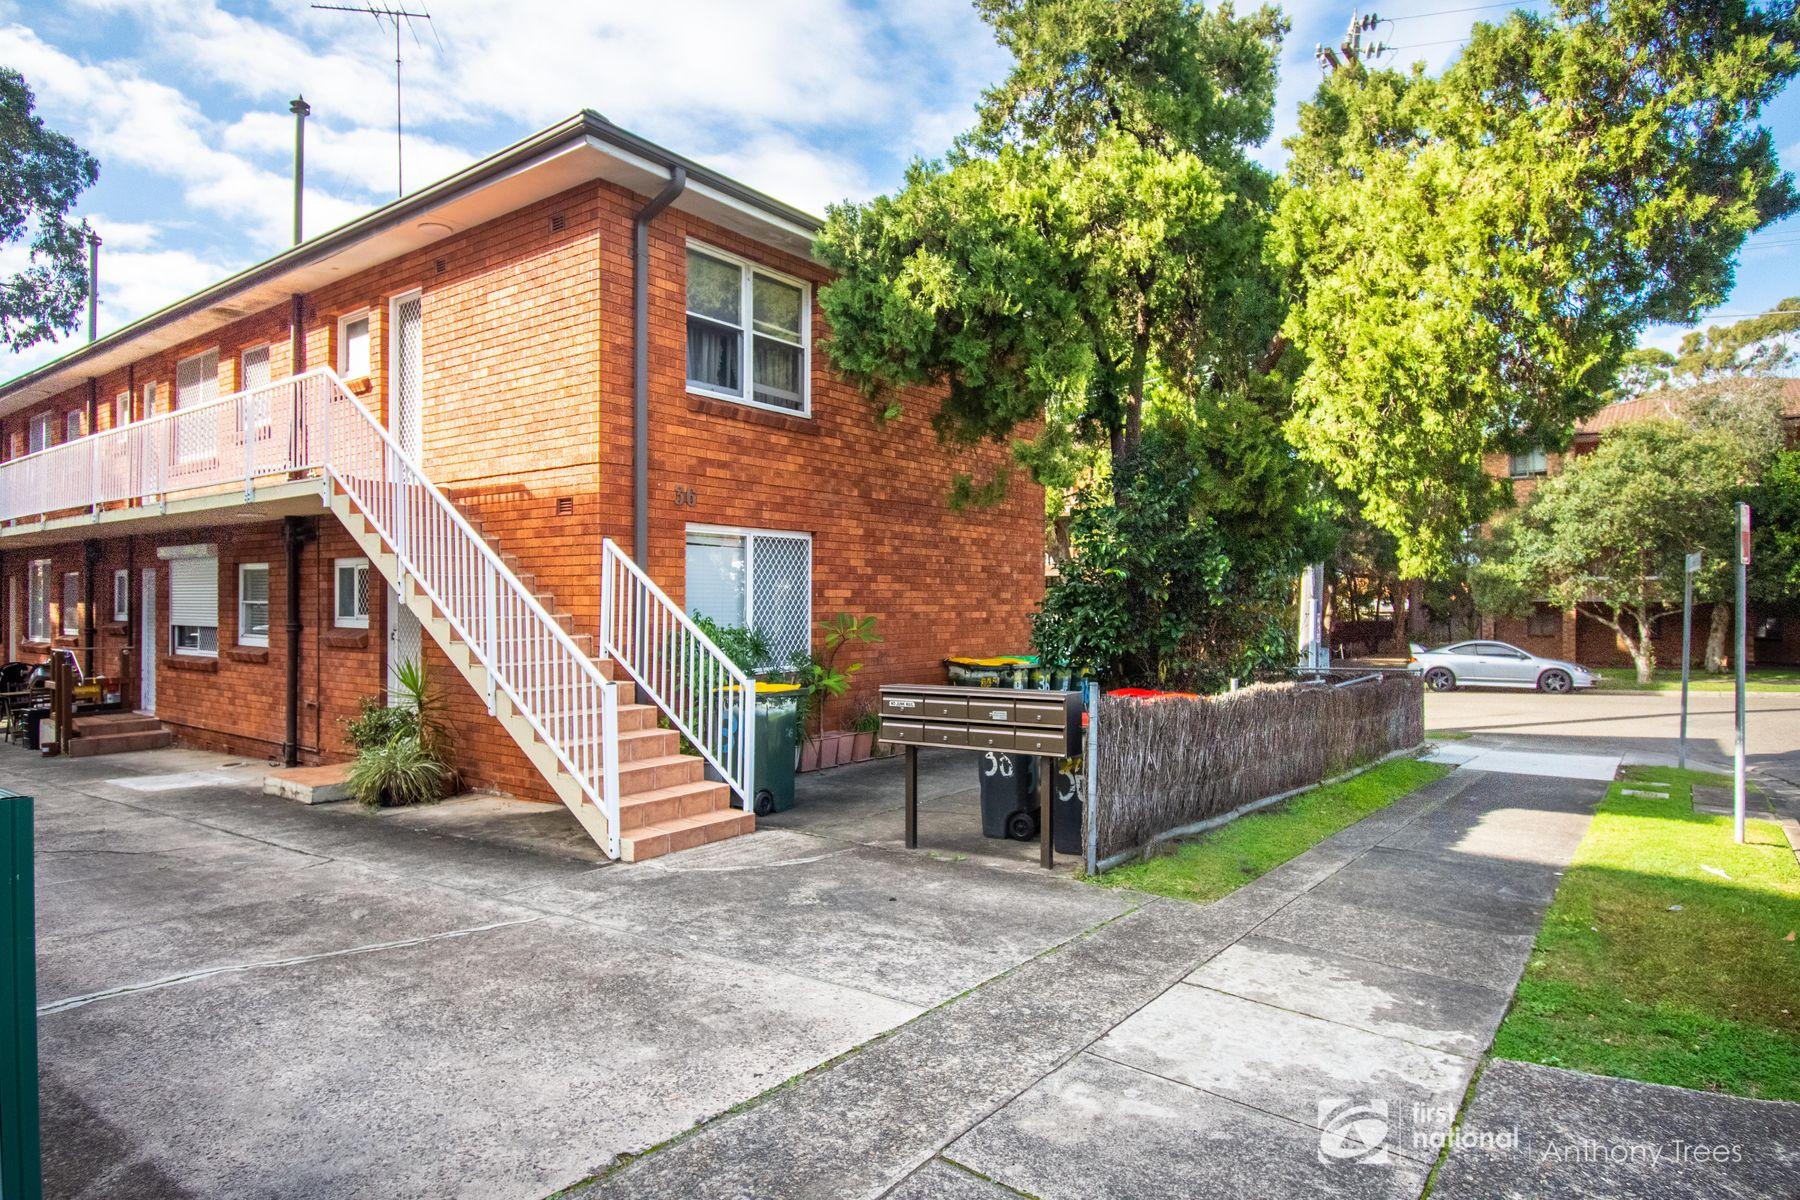 5/36 Garfield Street, Carlton NSW 2218 - Apartment For ...